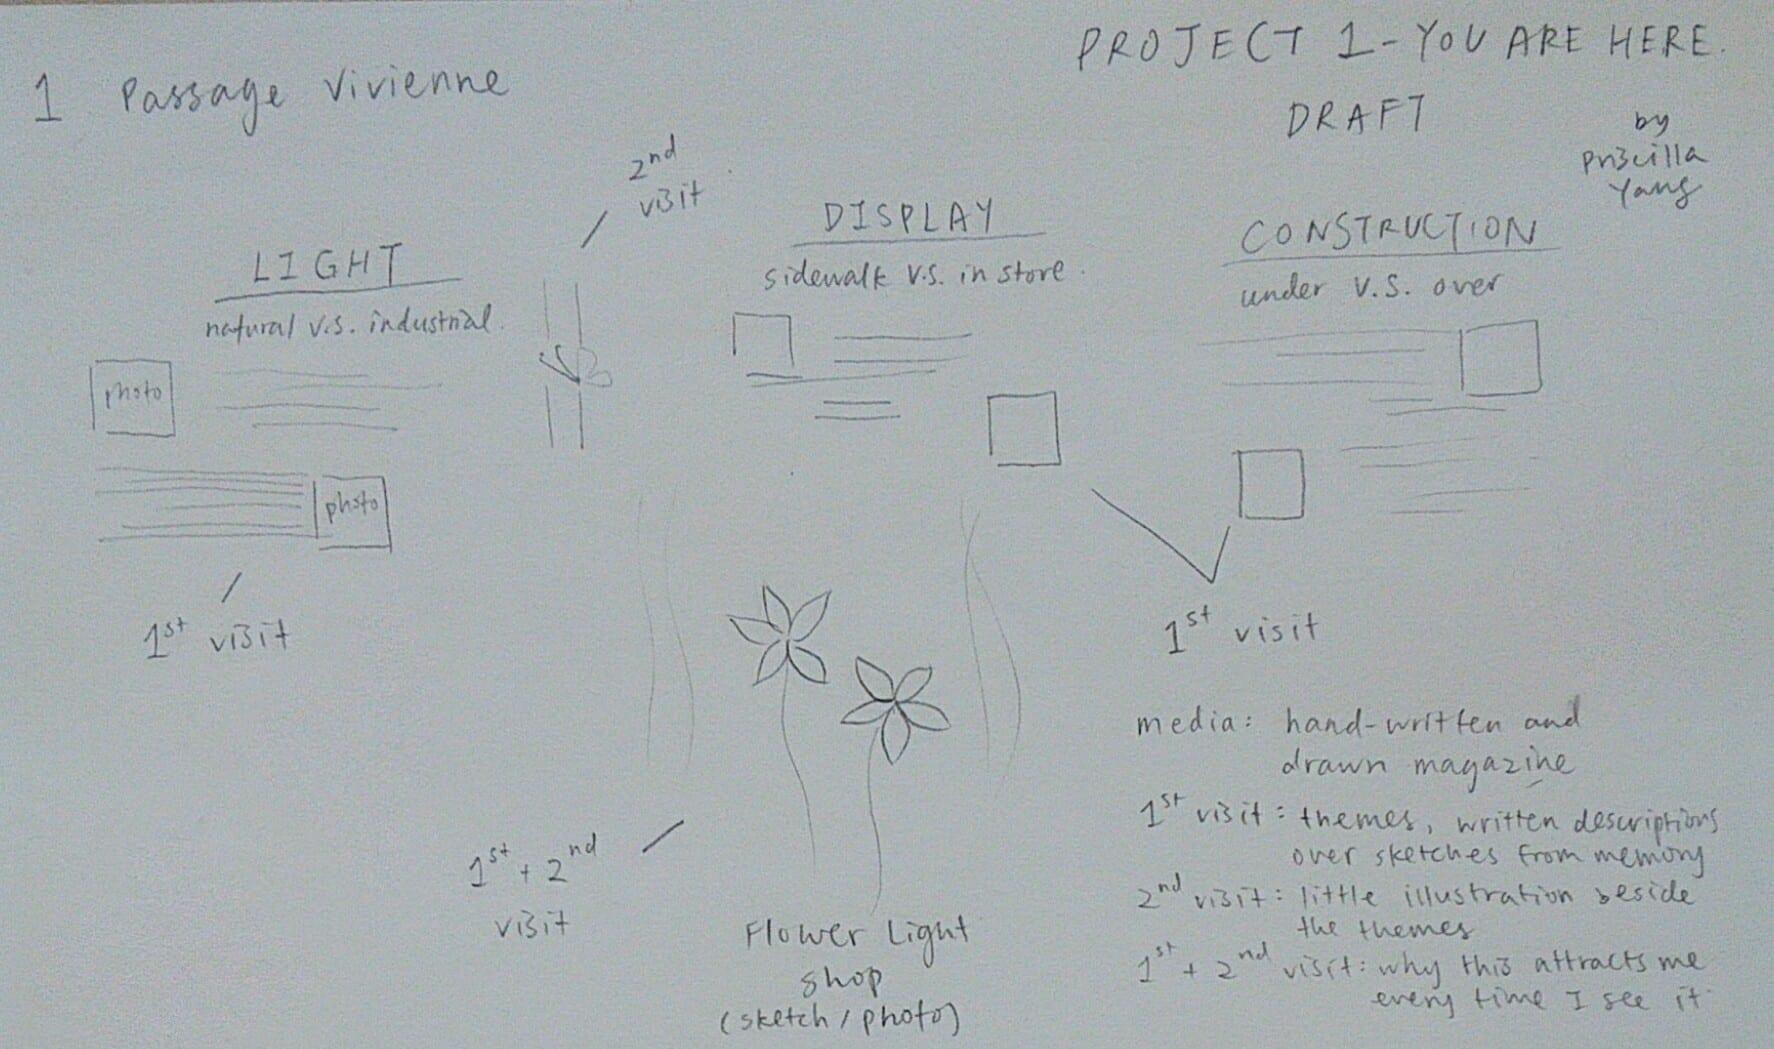 Process of Ideas